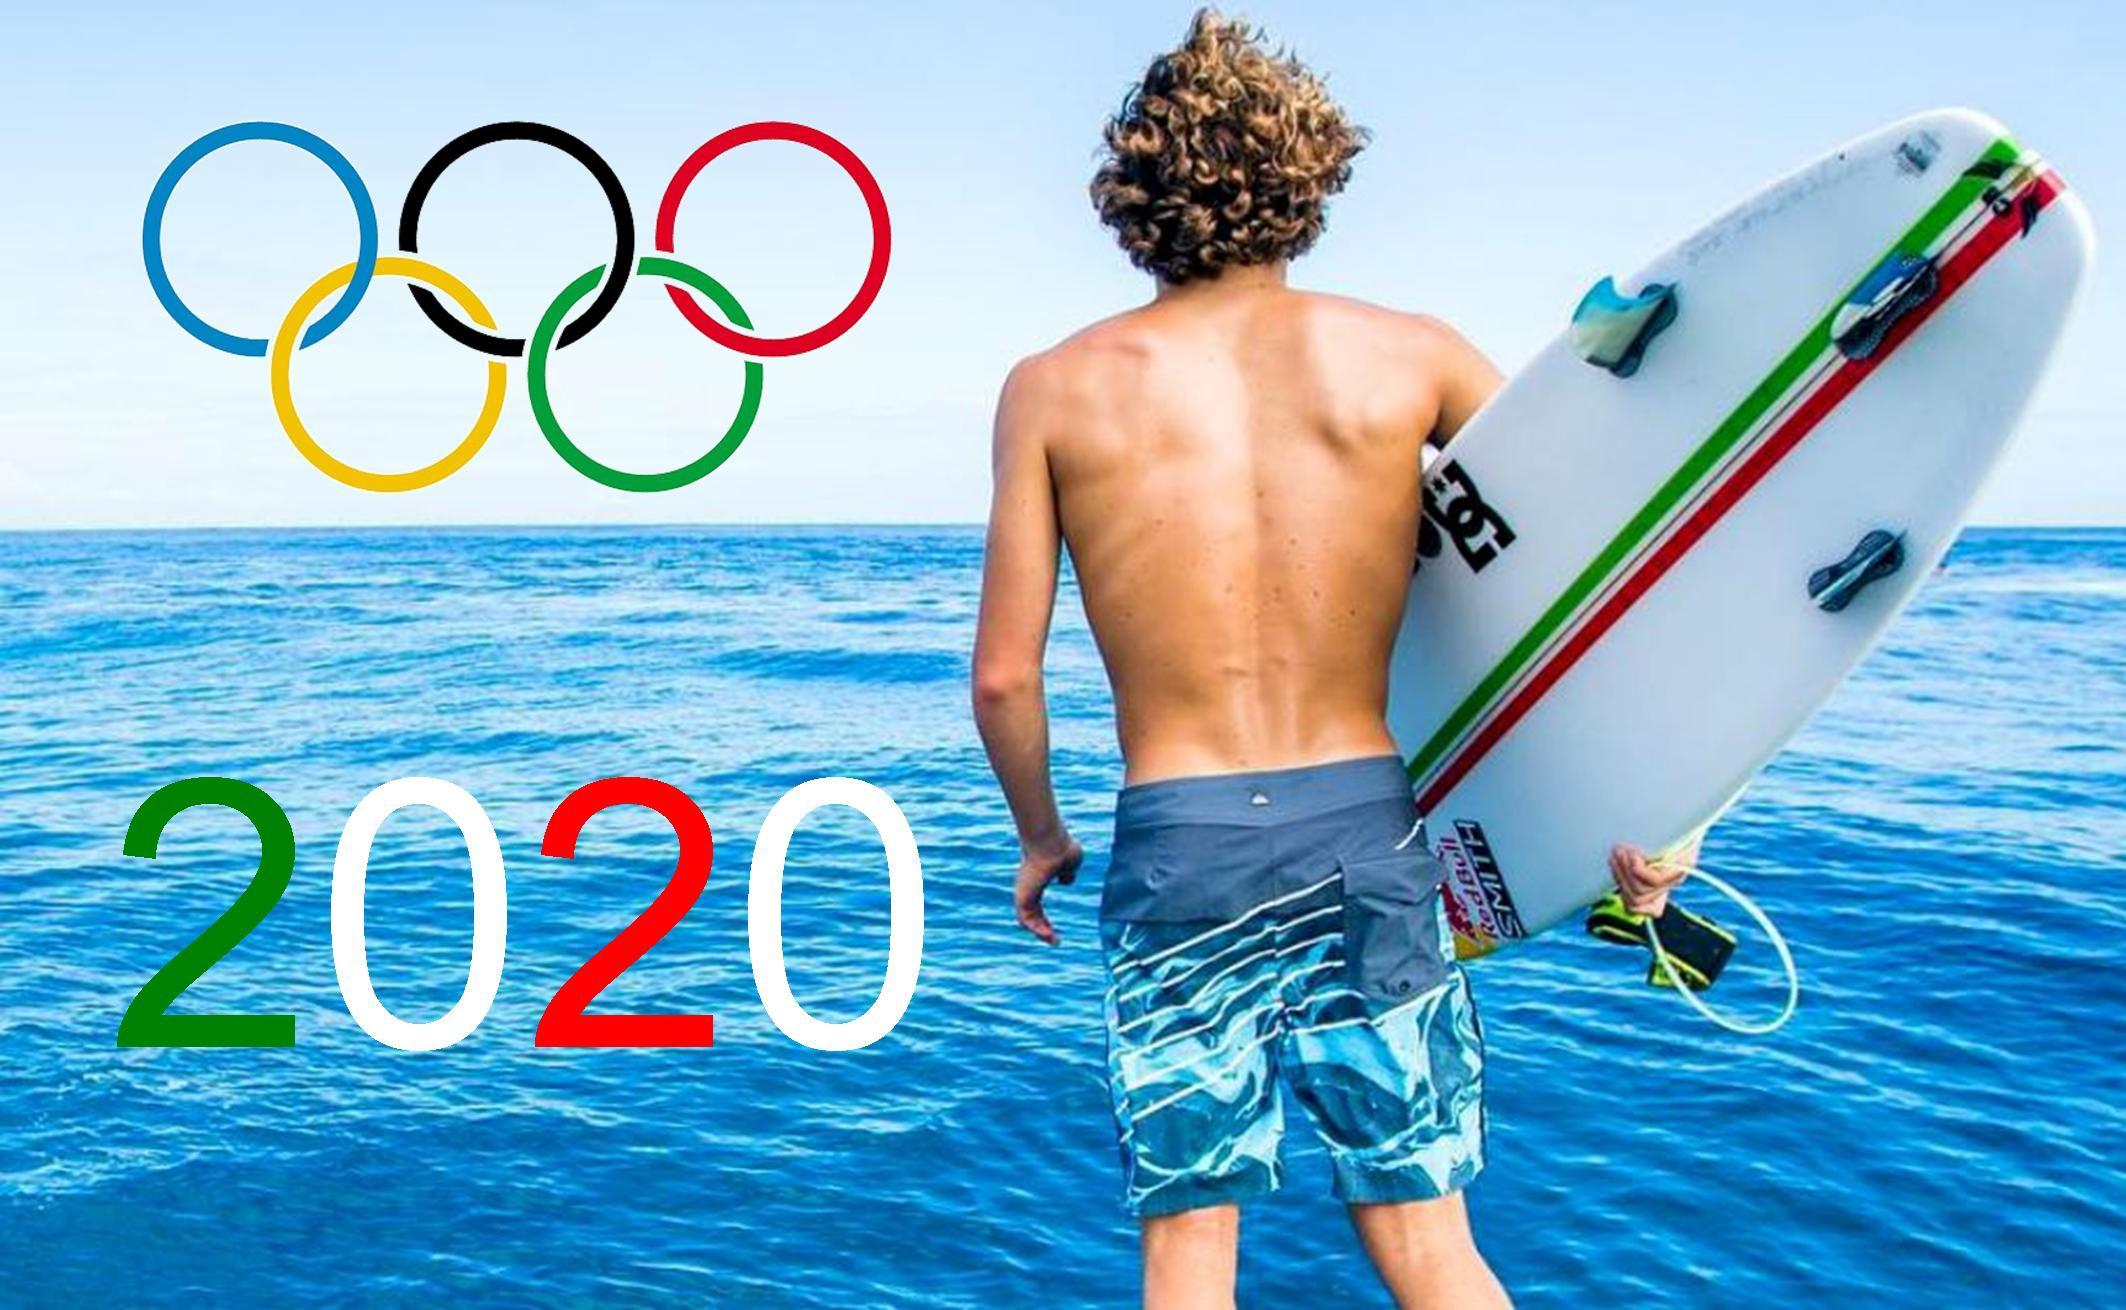 Olimpiadi 2020 con il SURF